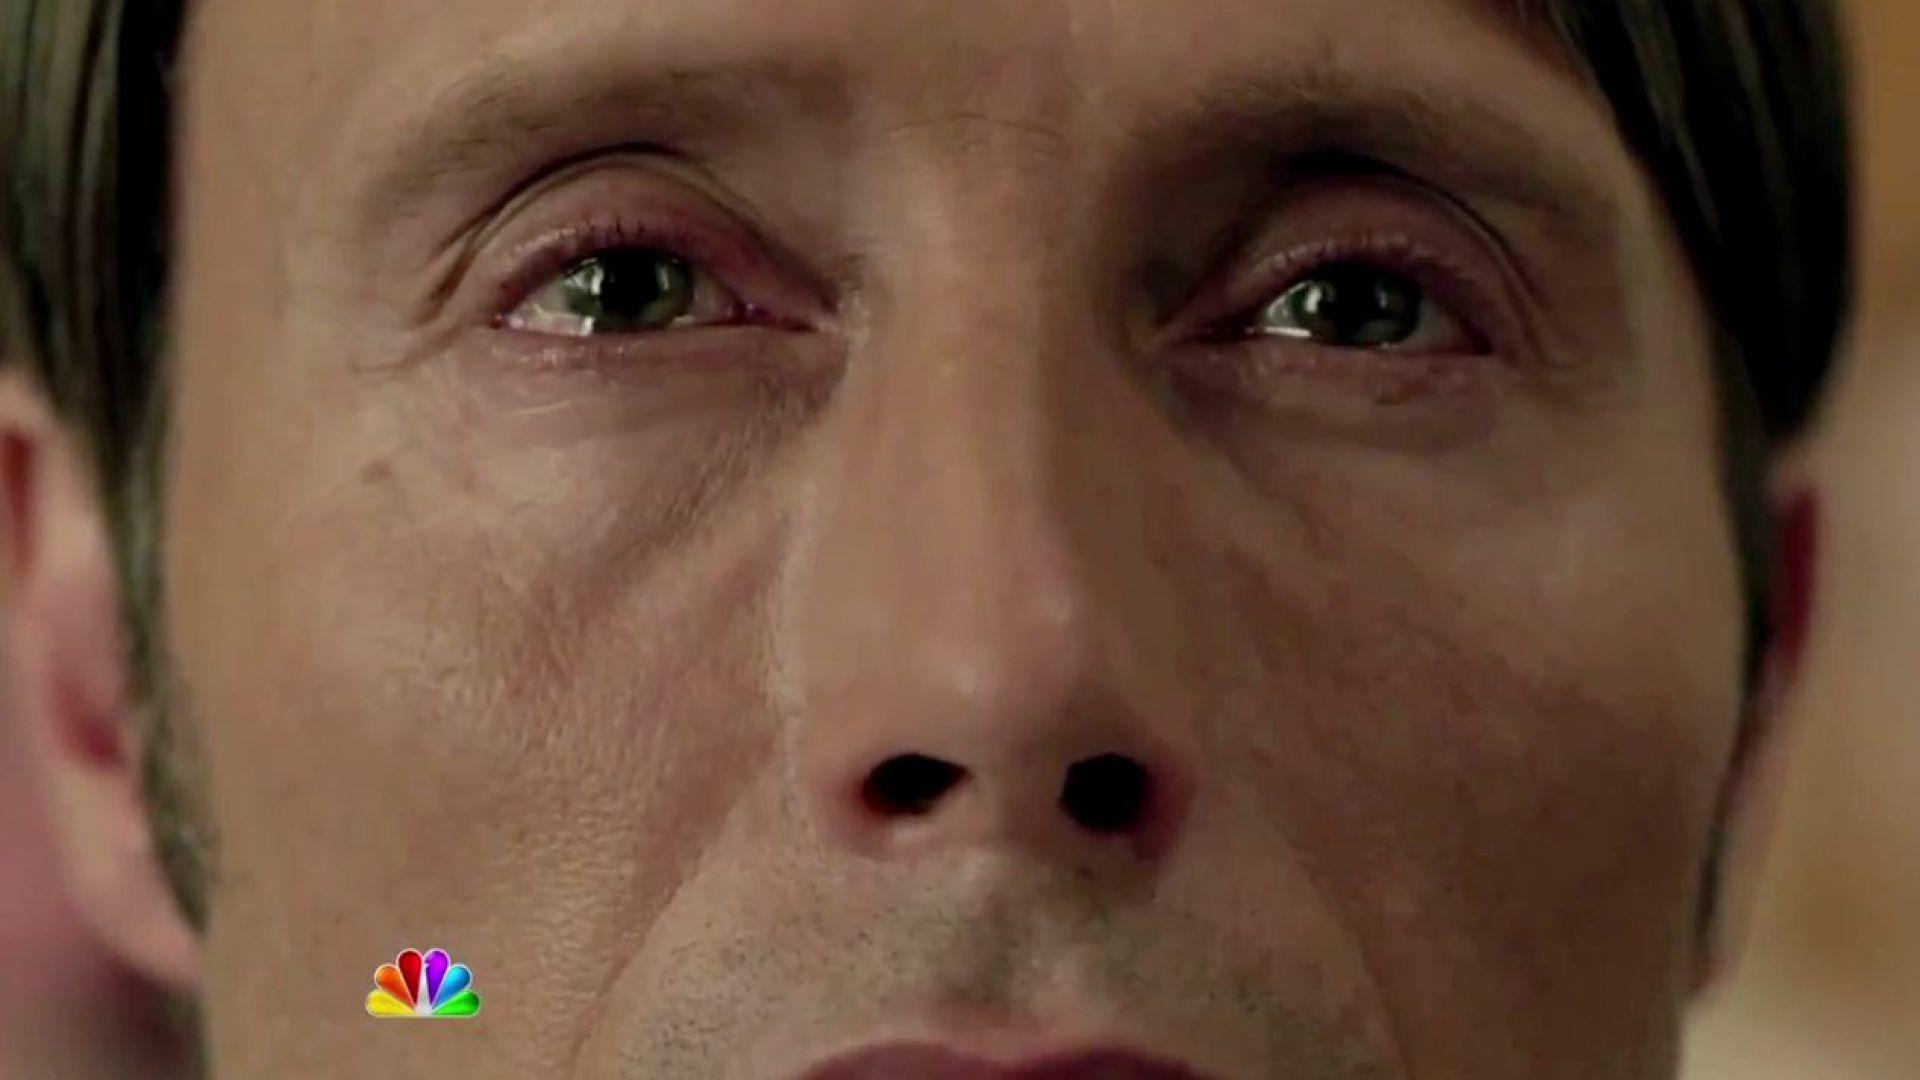 Hugh Dancy and Mads Mikkelsen talk about creating Hannibal